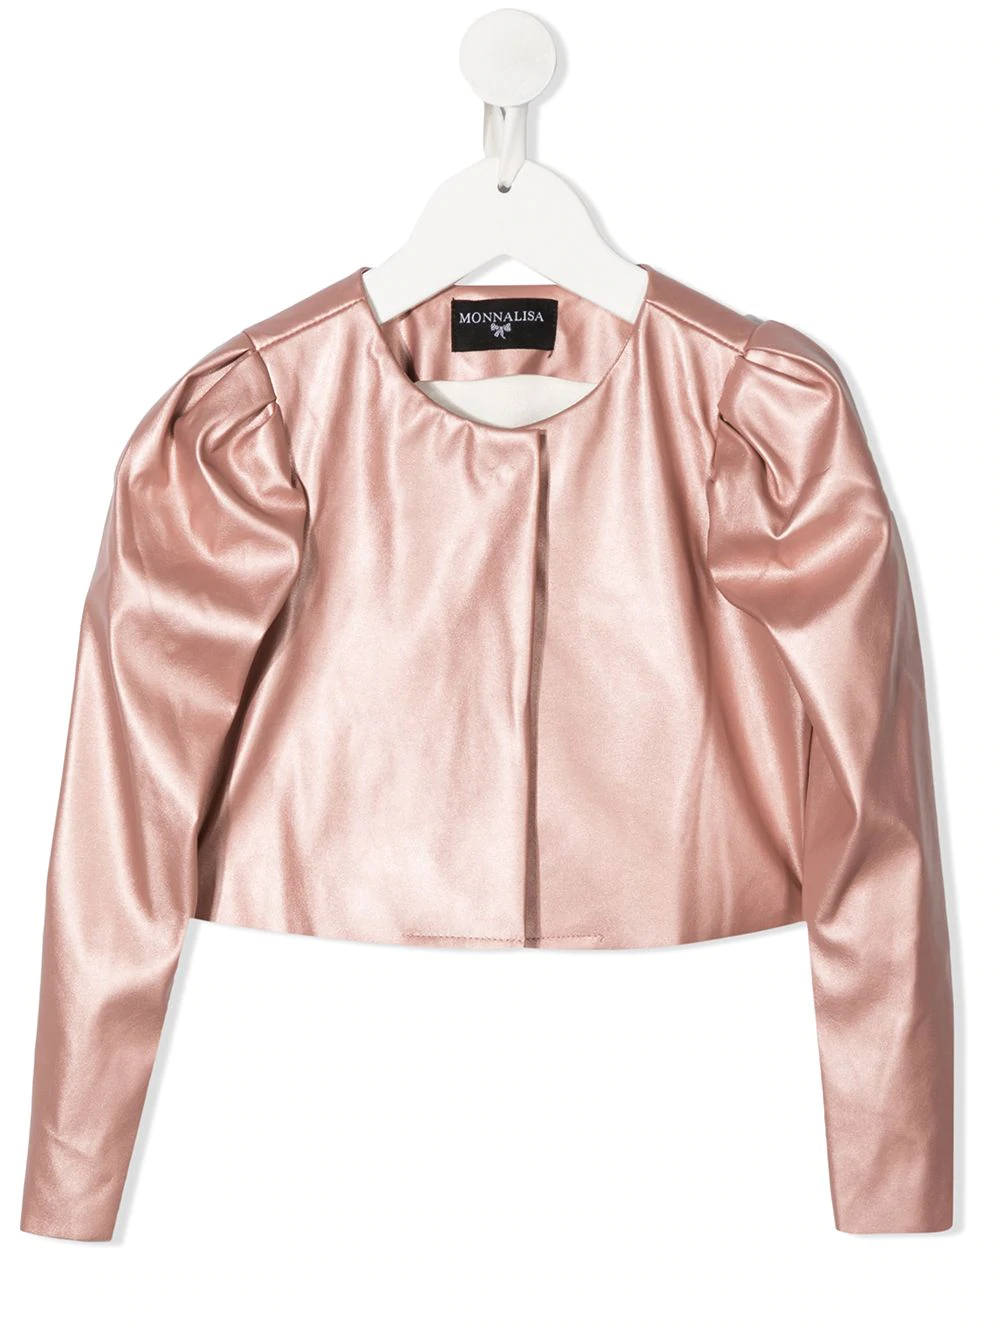 Jacket Monnalisa MONNALISA | 3 | 7961046046090R